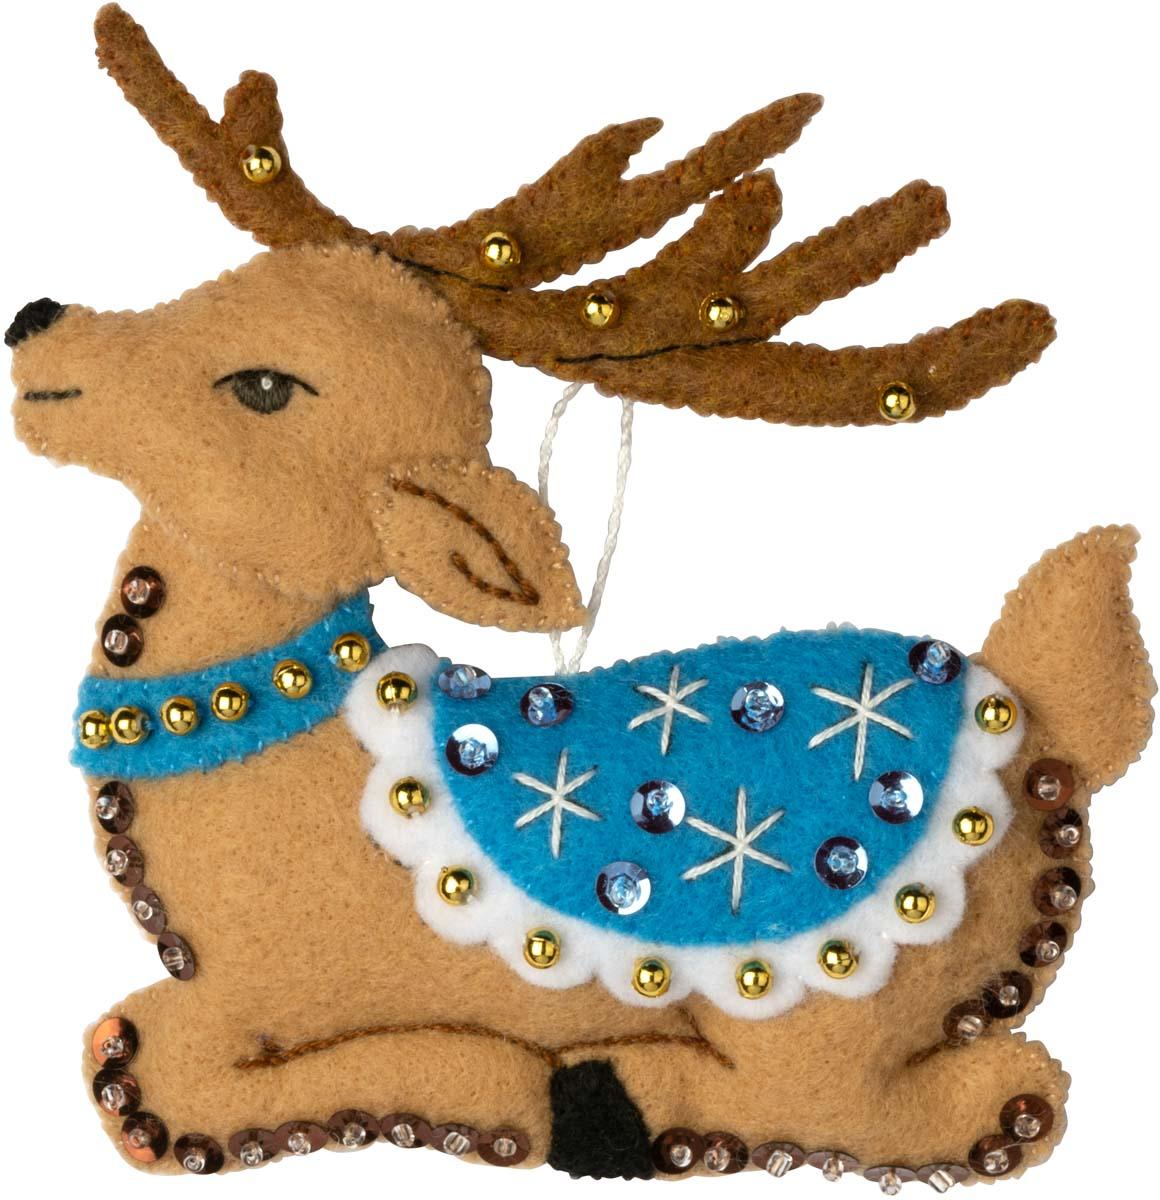 Bucilla ® Seasonal - Felt - Ornament Kits - Festive Reindeer - 89299E